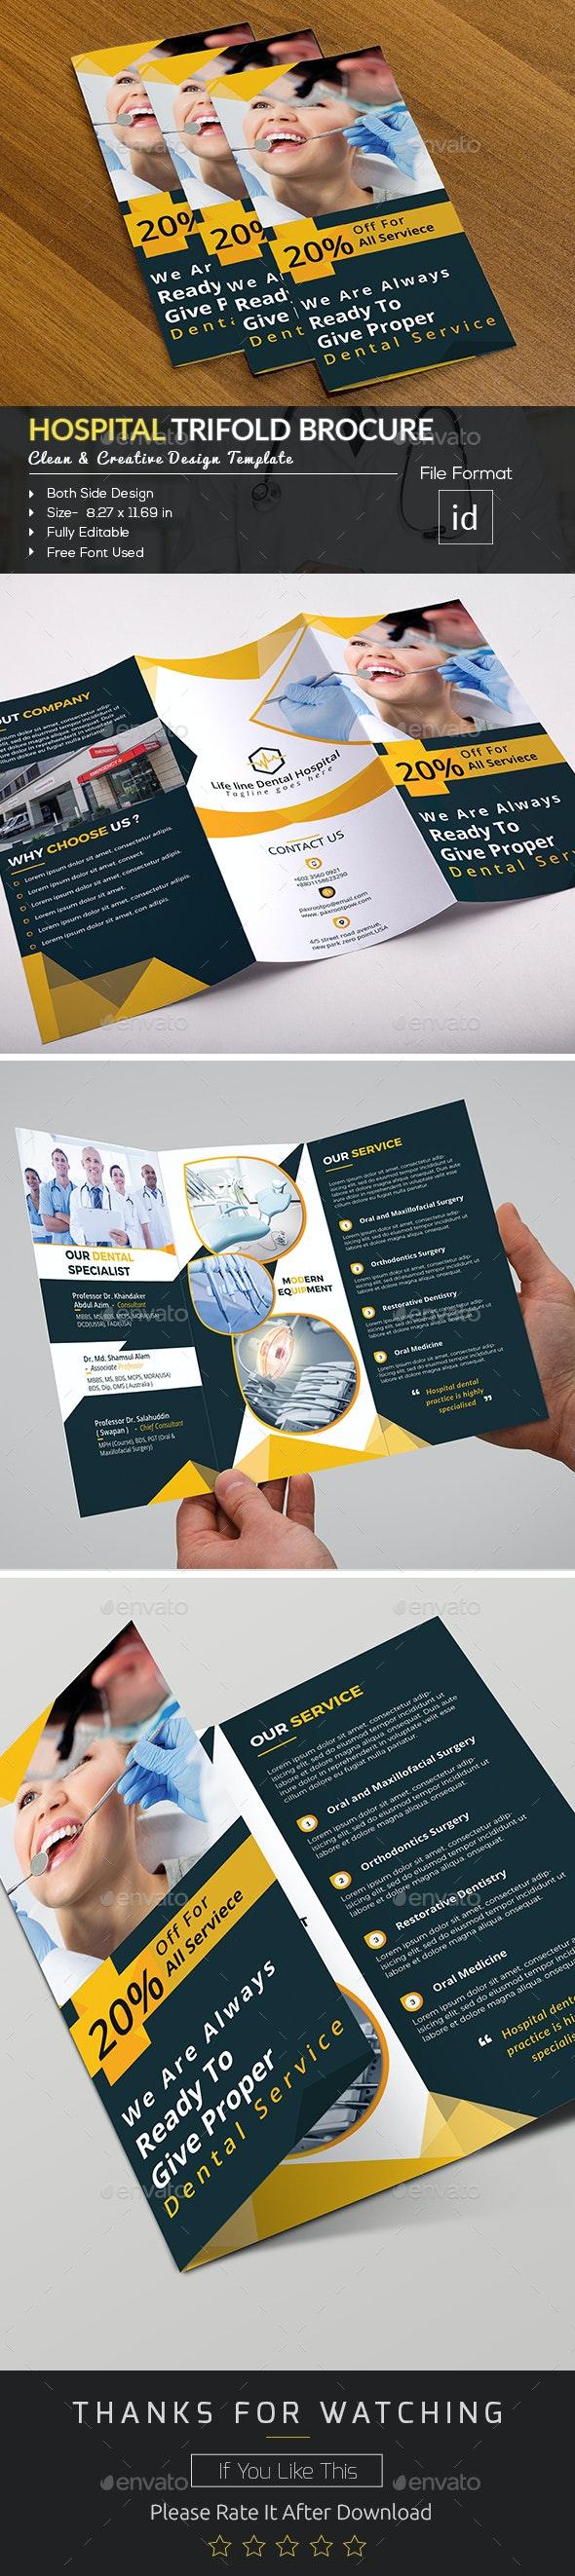 Hospital Trifold Brochure Template - Brochures Print Templates